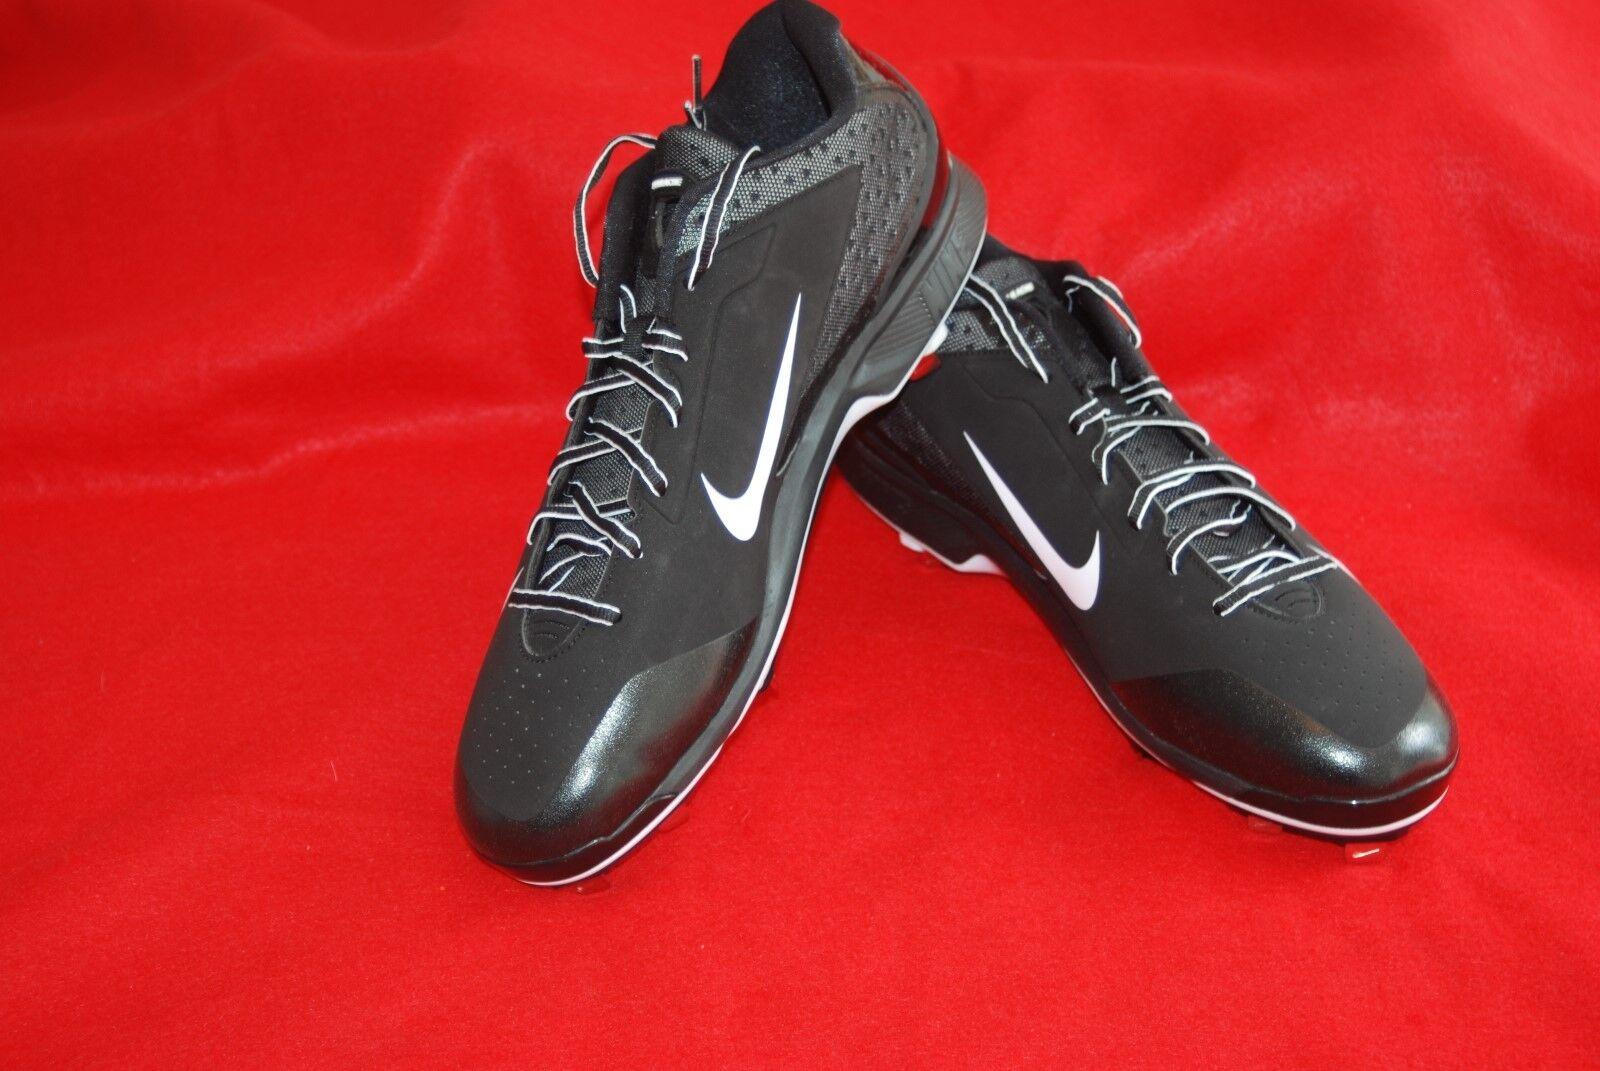 Nike Air Huarache Pro Low Metal Mens Baseball Cleat Black White 599233-001 Sz 16  best-selling model of the brand